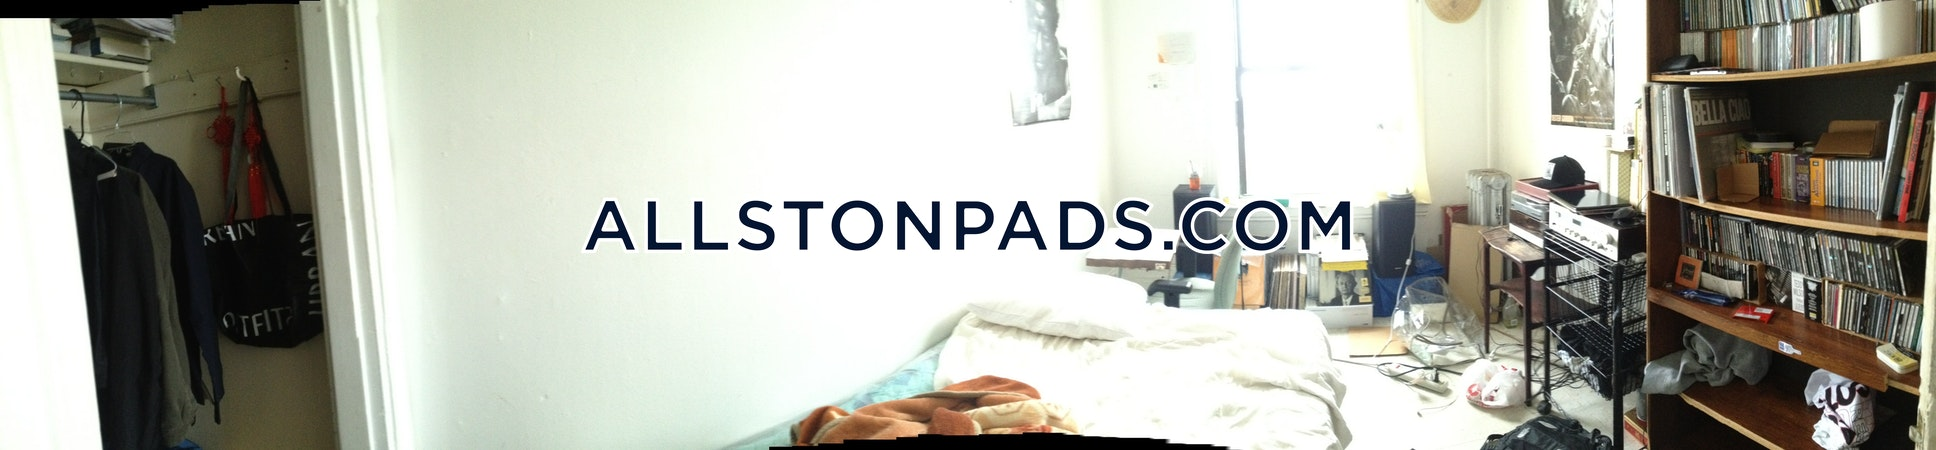 Allston 3 Beds 1 Bath Boston - $2,599